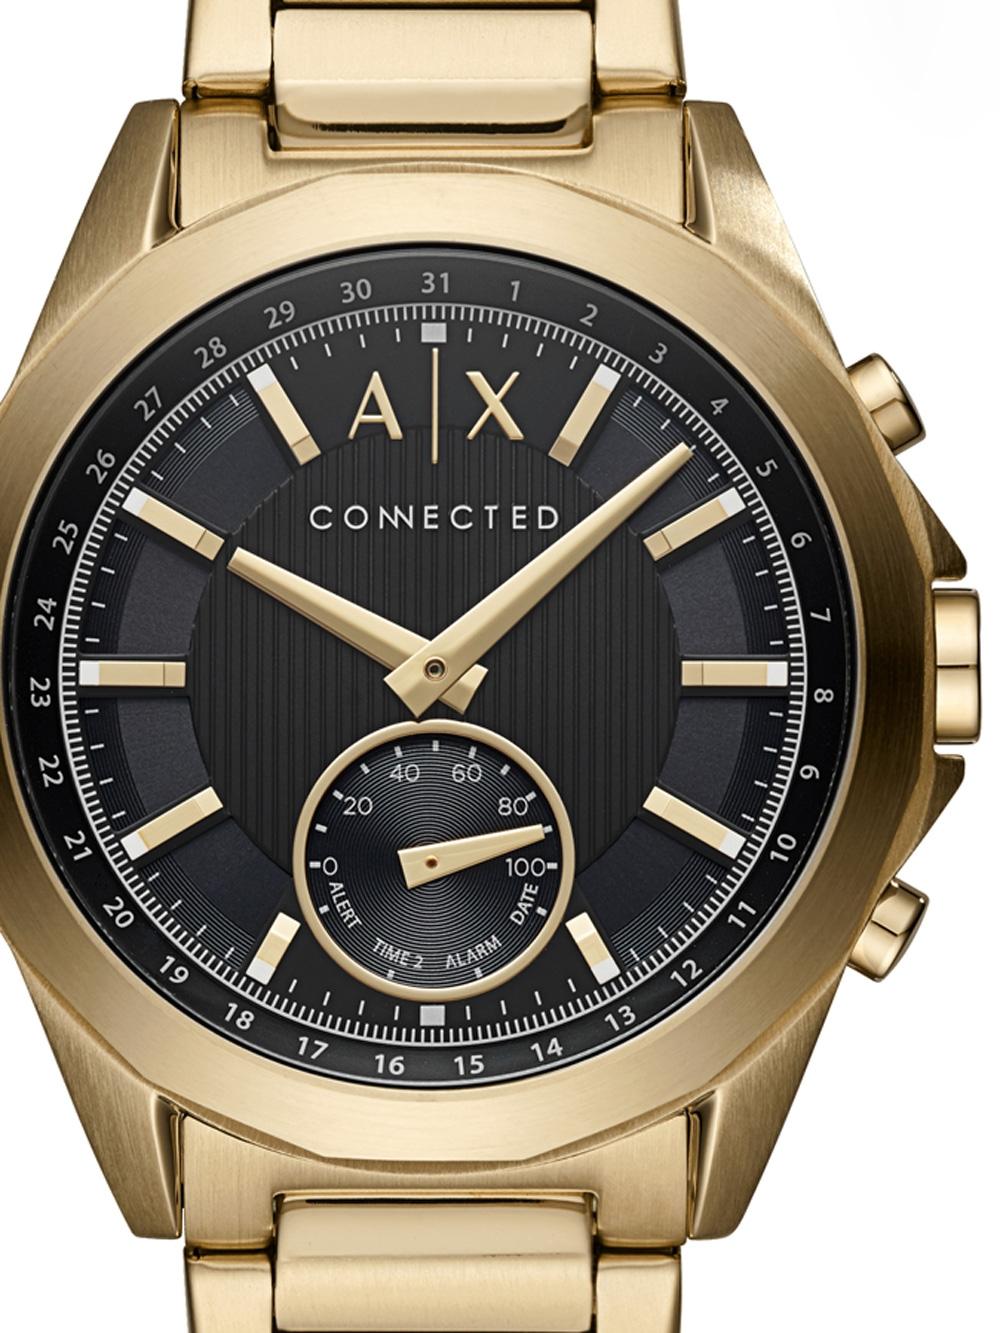 Armani Exchange AXT1008 Hybrid Smartwatch 44mm 5ATM